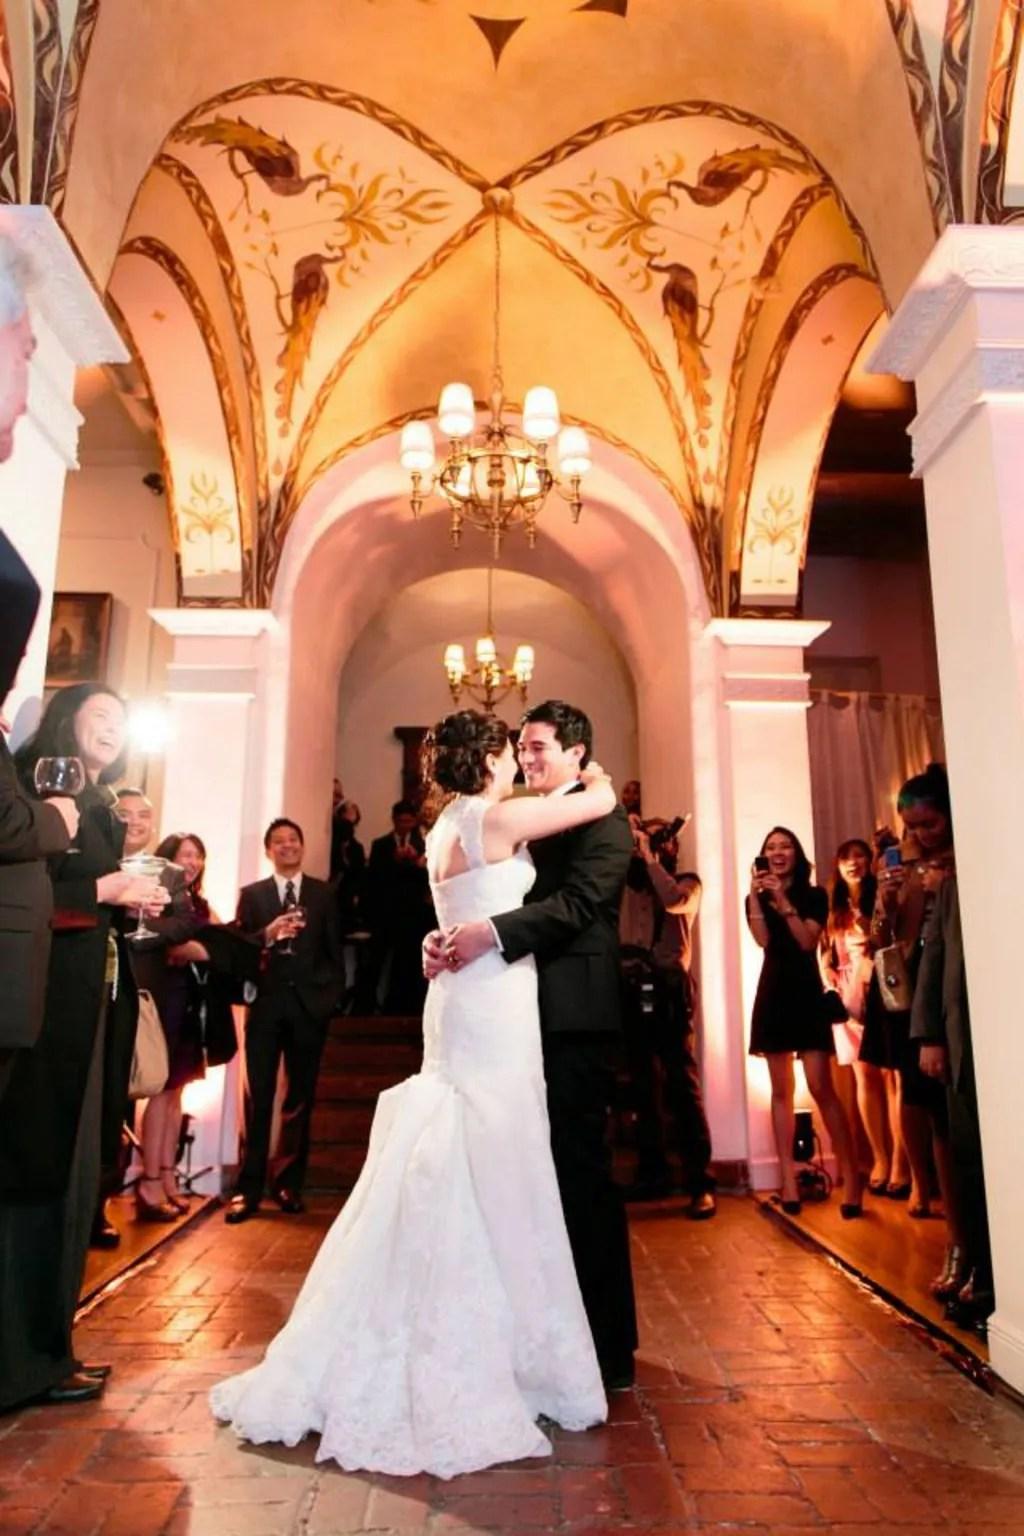 Scarlett Johansson Romain Dauriac Wedding Pictures